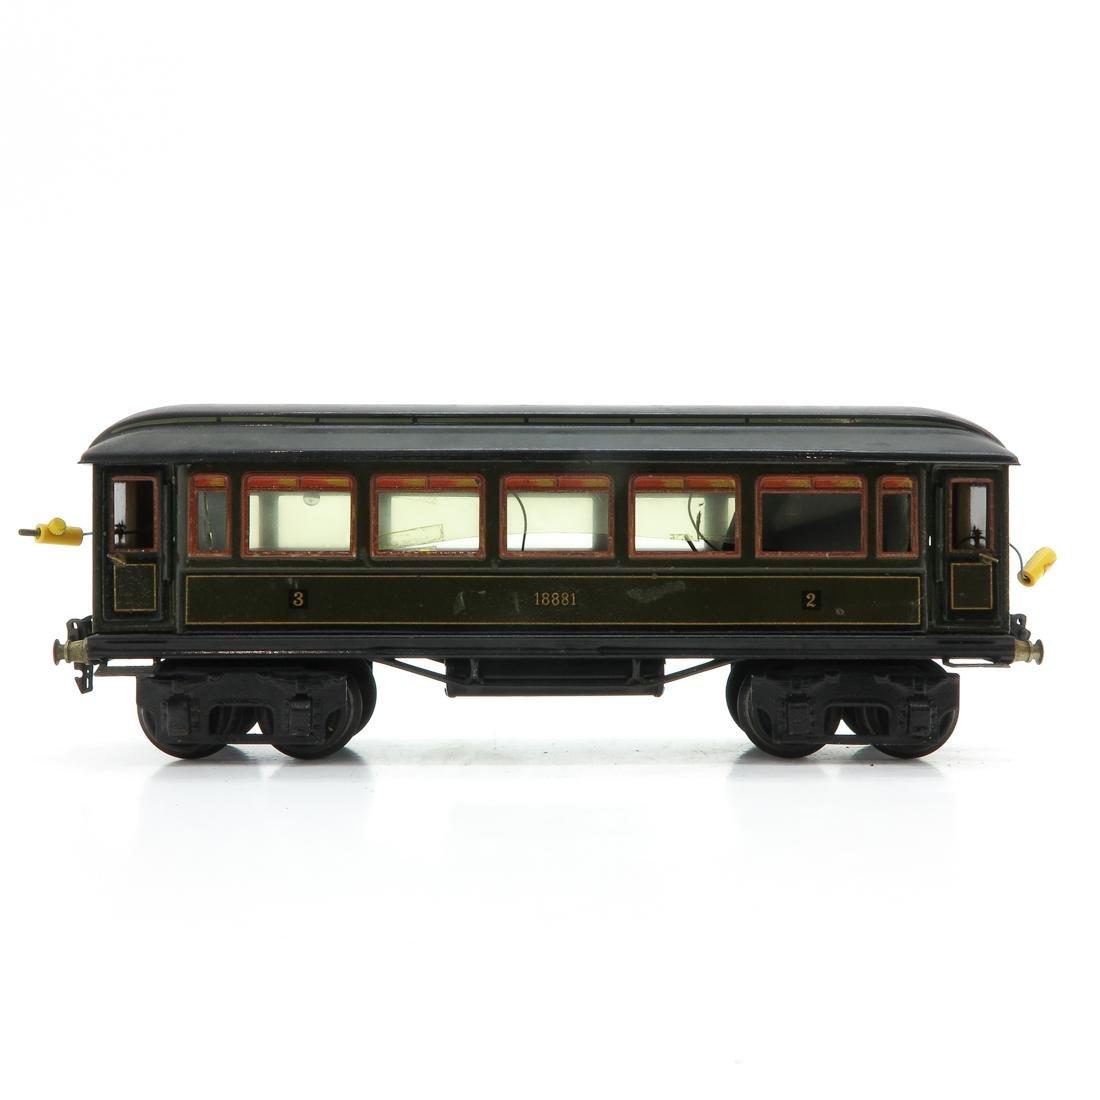 Vintage Marklin Passenger Car